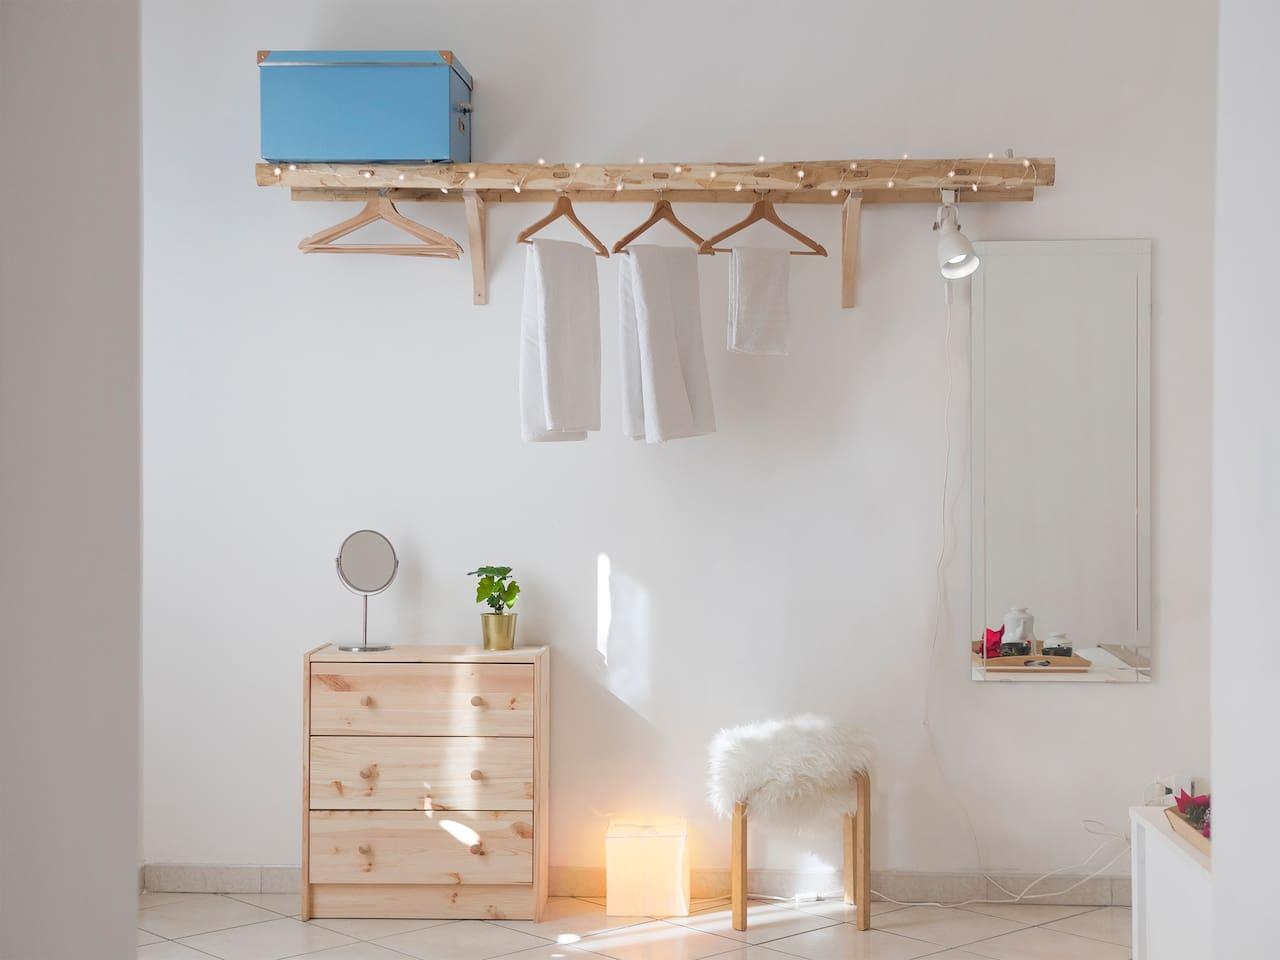 S.Eframo House creative wardrobe